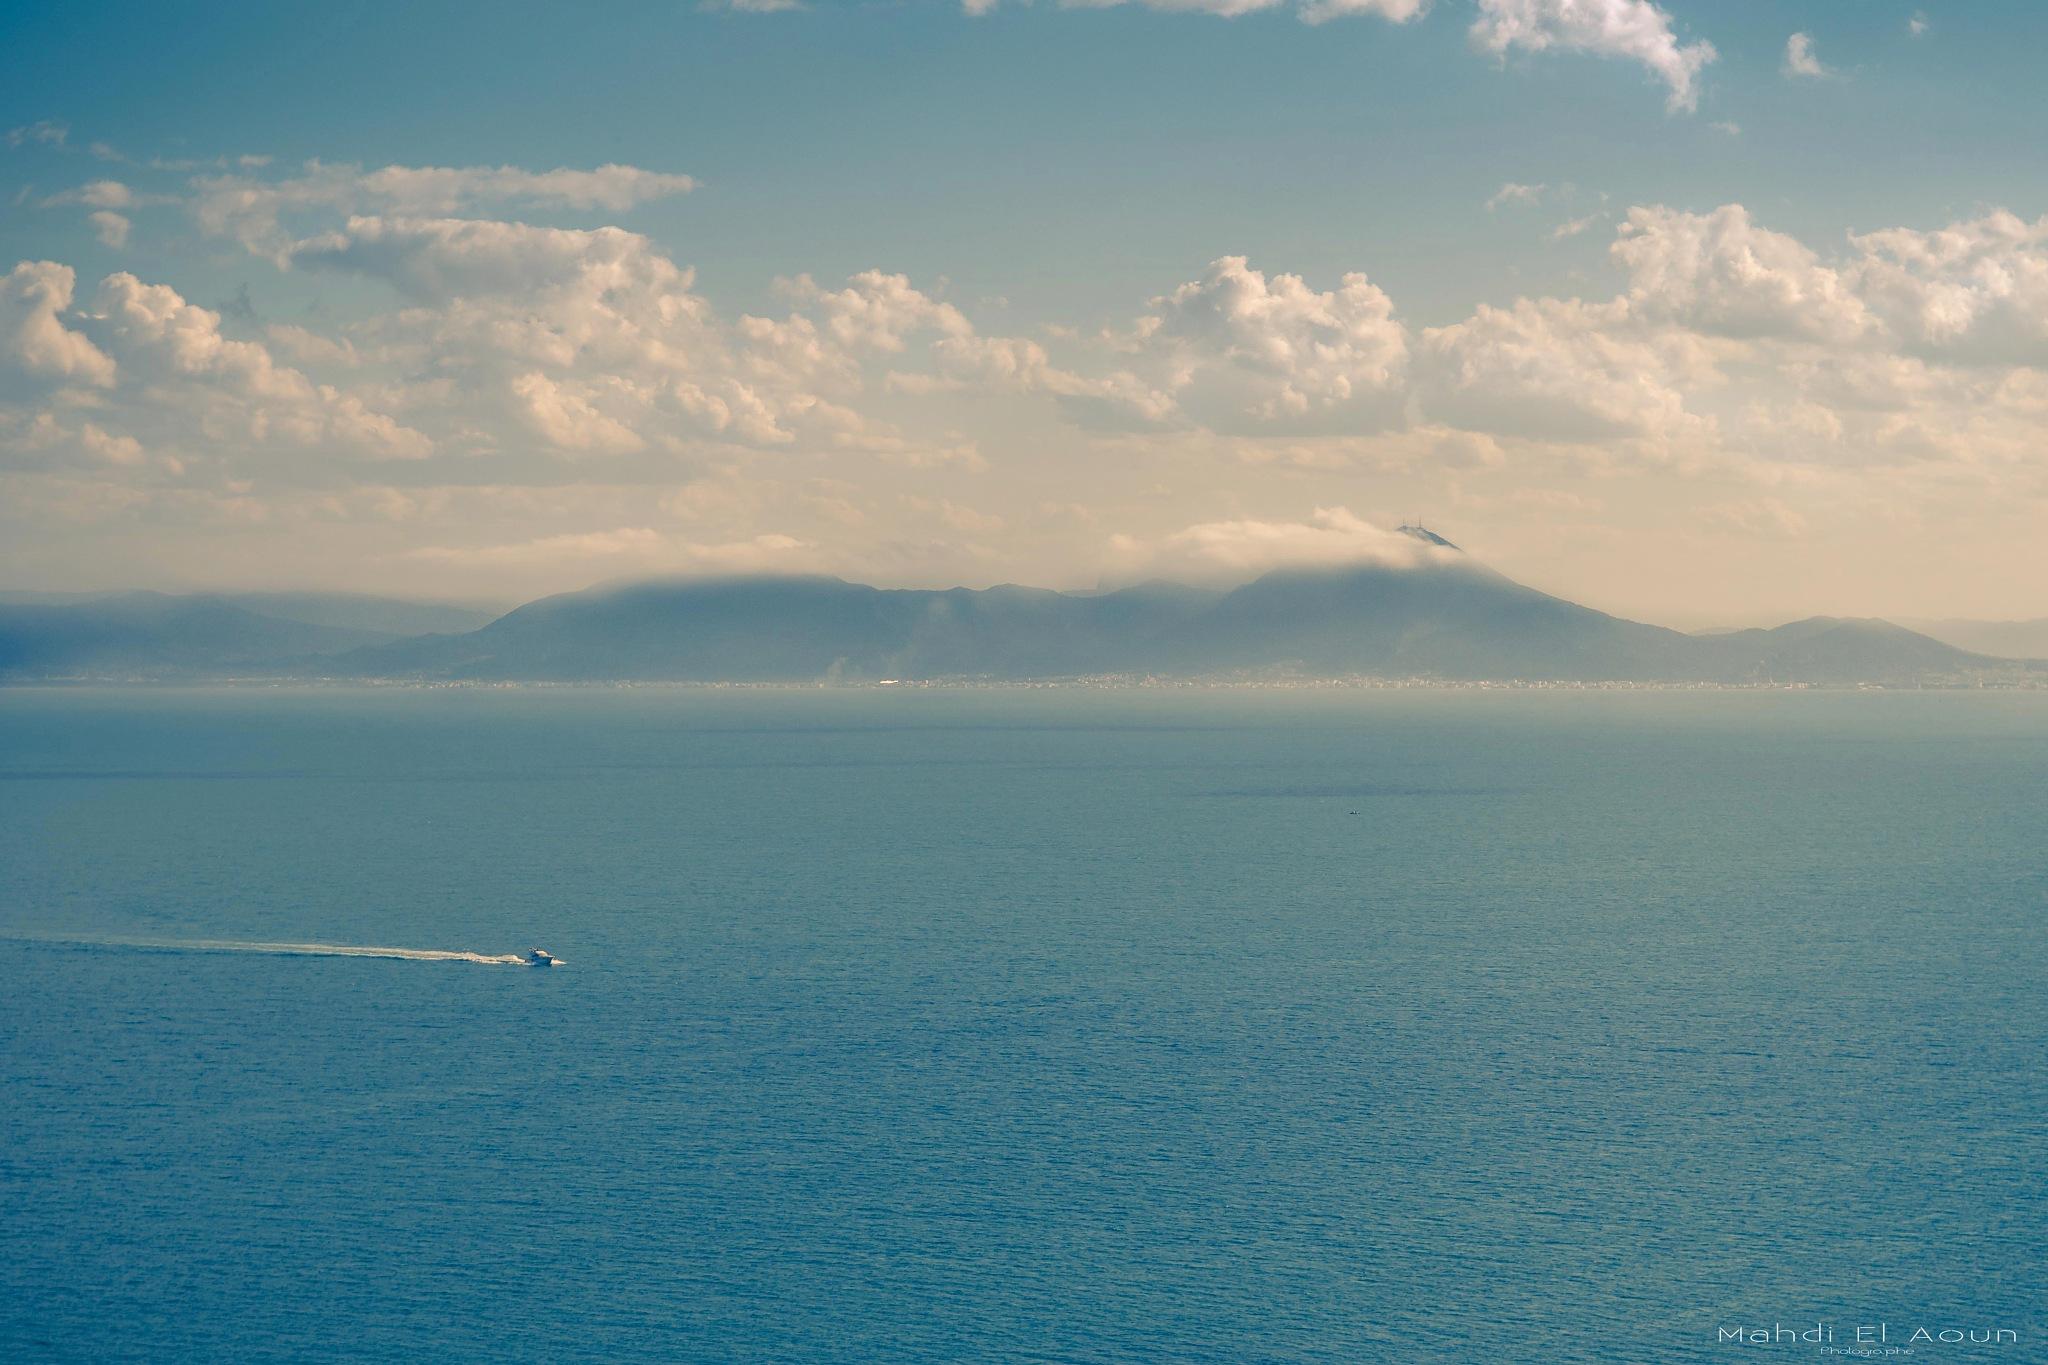 Mountains over the sky by Mahdi El Aoun